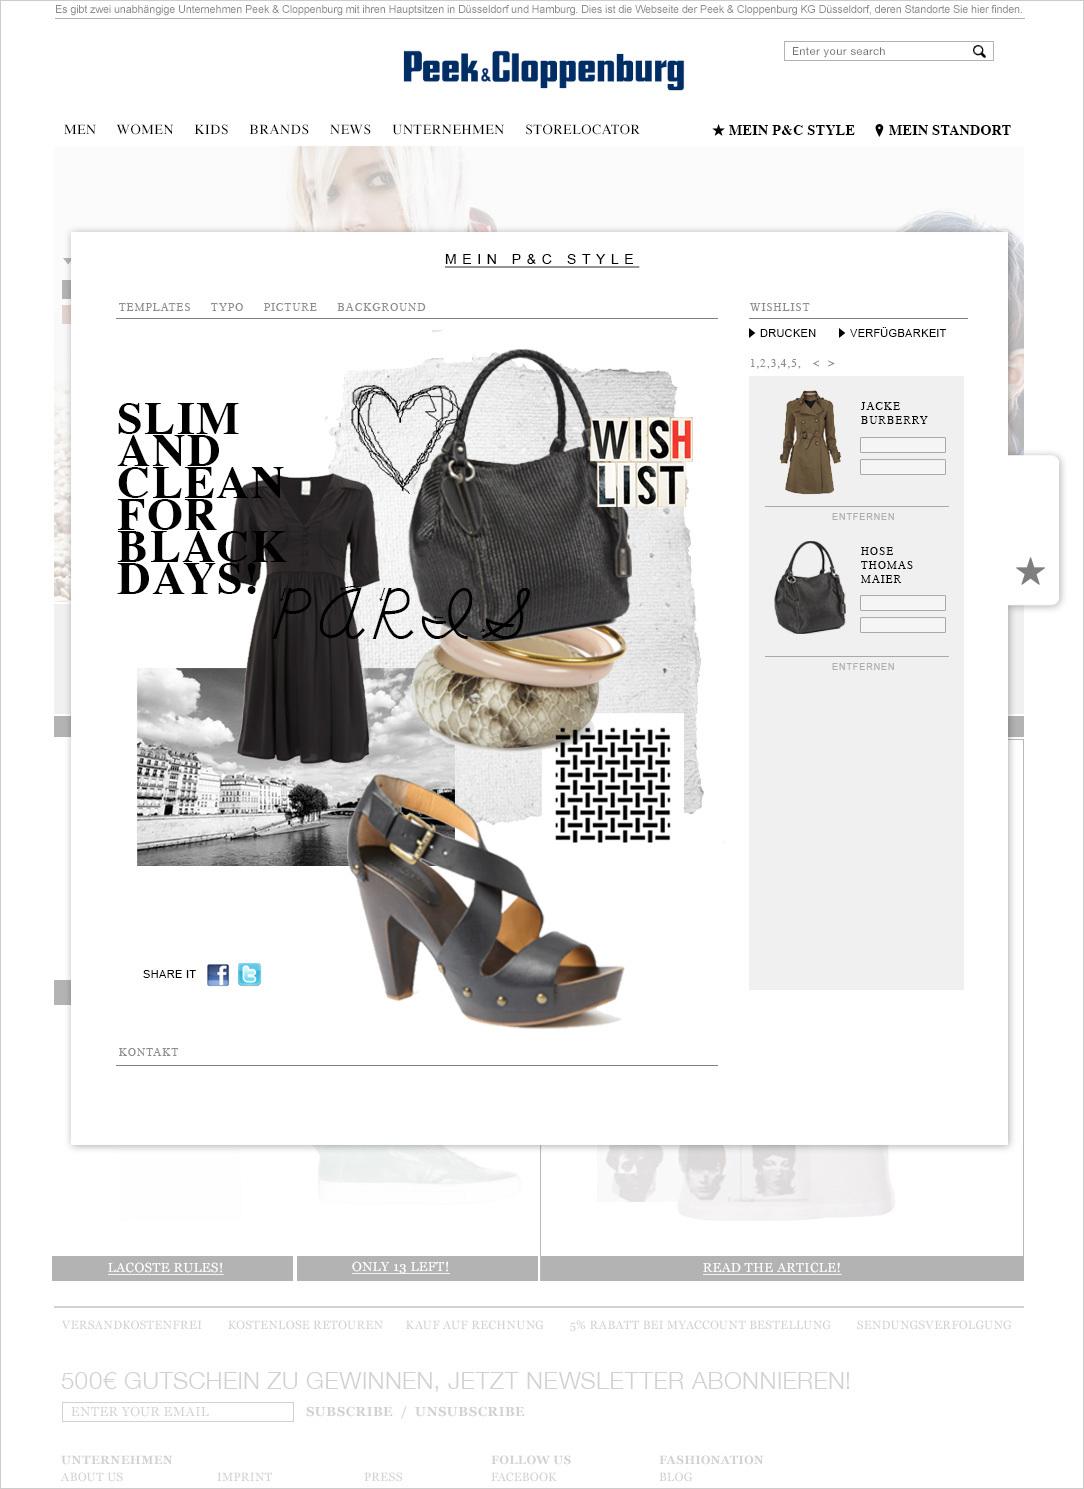 WERBEWELT-Peek-Cloppenburg-eCommerce-Online-Store-3.jpg